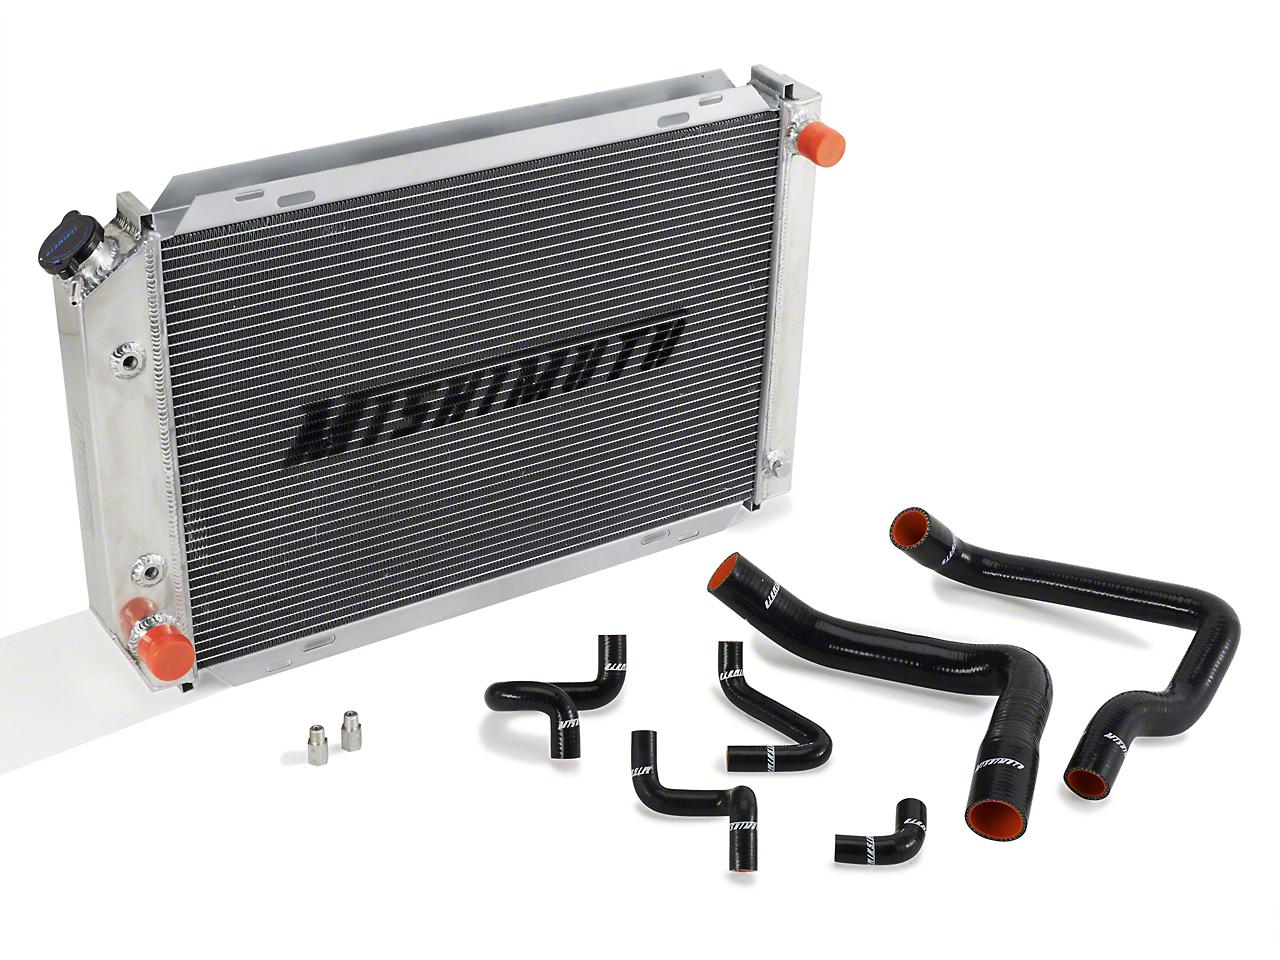 Mishimoto Radiator and Silicone Hose Kit - Automatic (86-93 5.0L)